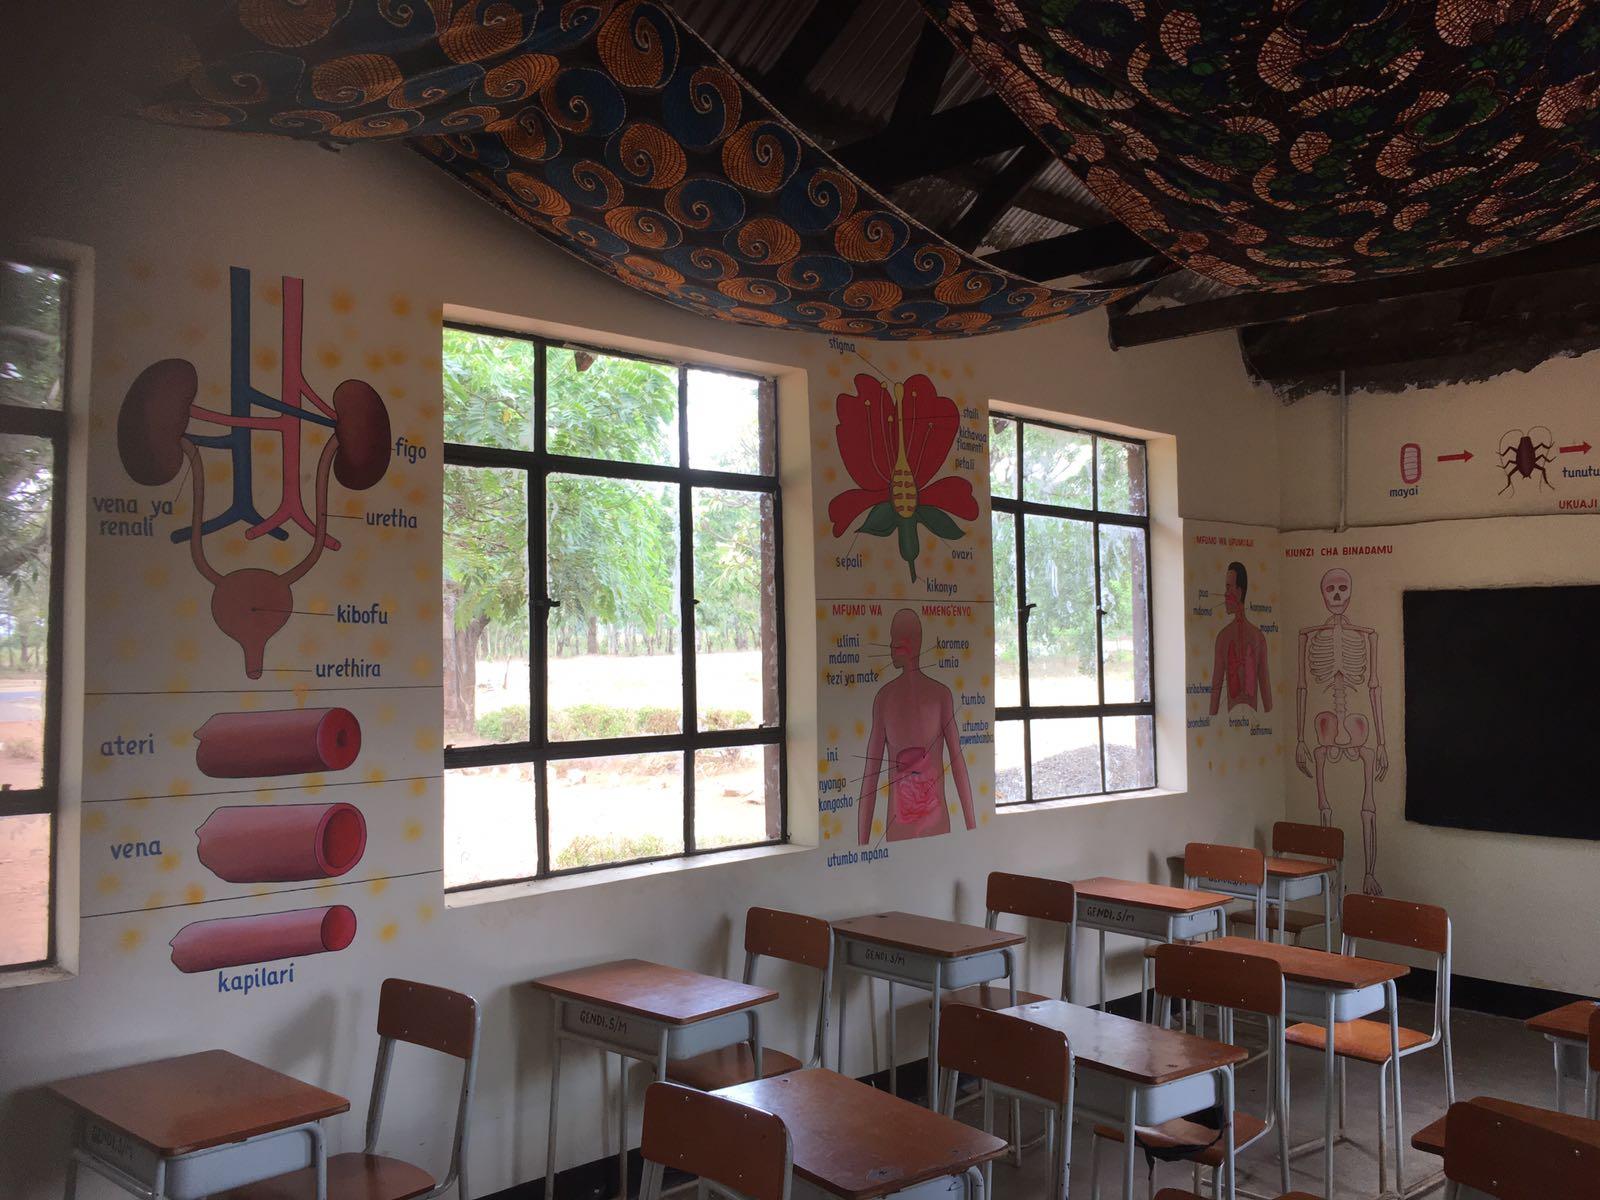 gendi classroom 1.jpg